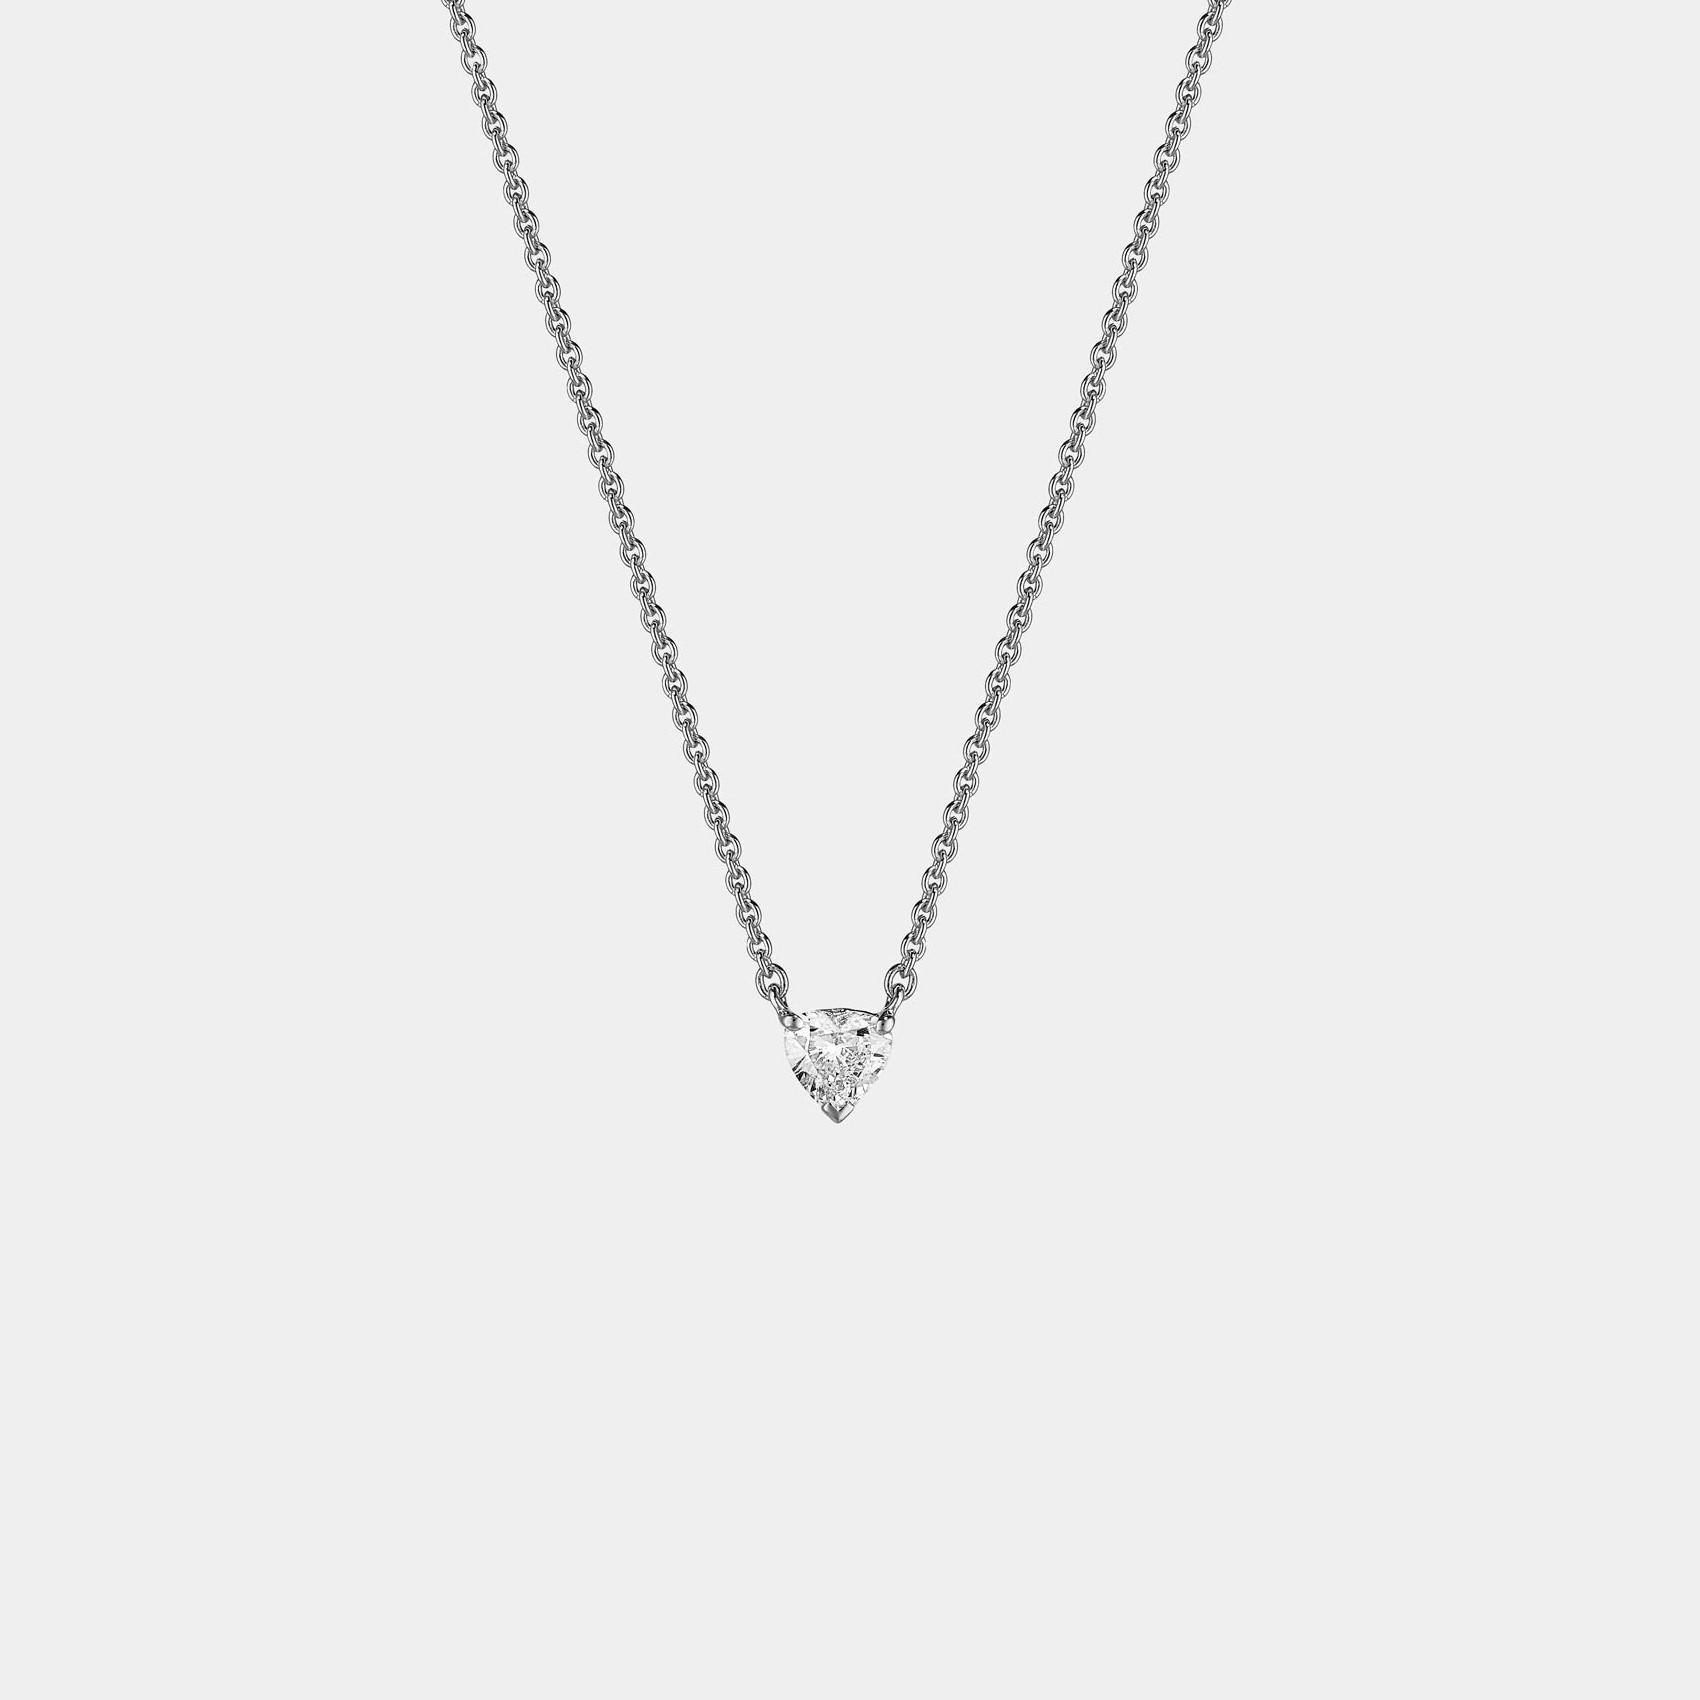 Girocollo collana punto luce oro bianco diamante cuore CL021